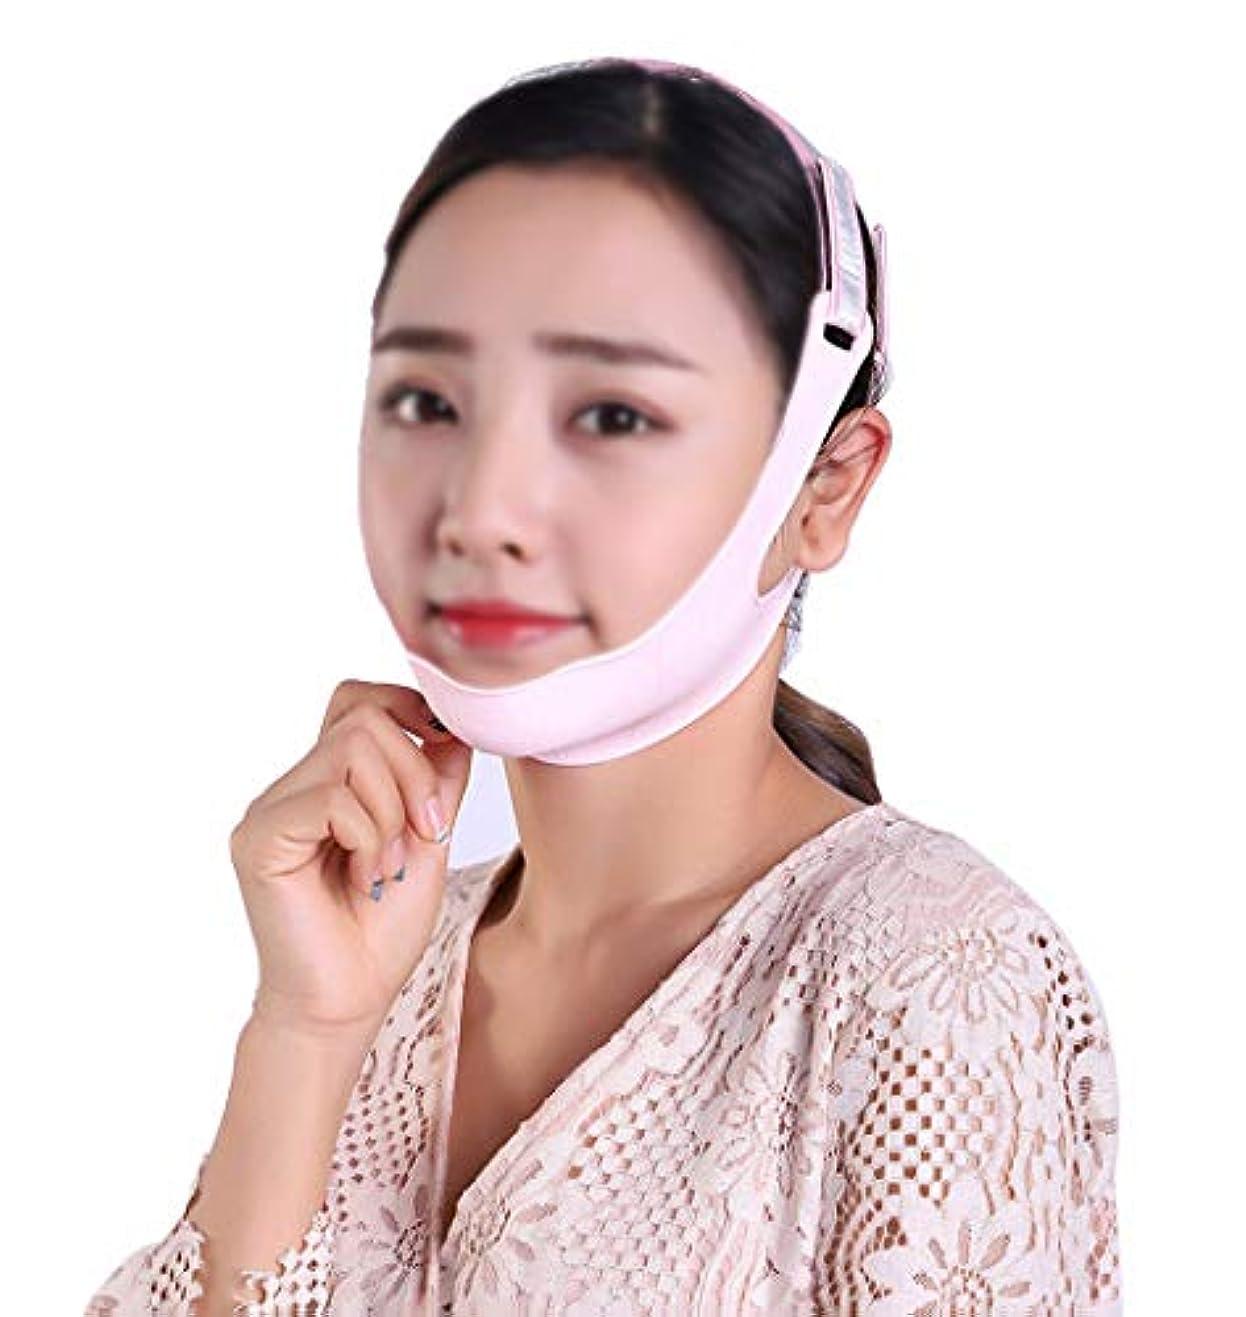 GLJJQMY フェイシャルリフティングマスクシリコンVマスク引き締めフェイシャル包帯スモールVフェイスアーティファクト防止リラクゼーションフェイシャル&ネックリフティング 顔用整形マスク (Size : L)